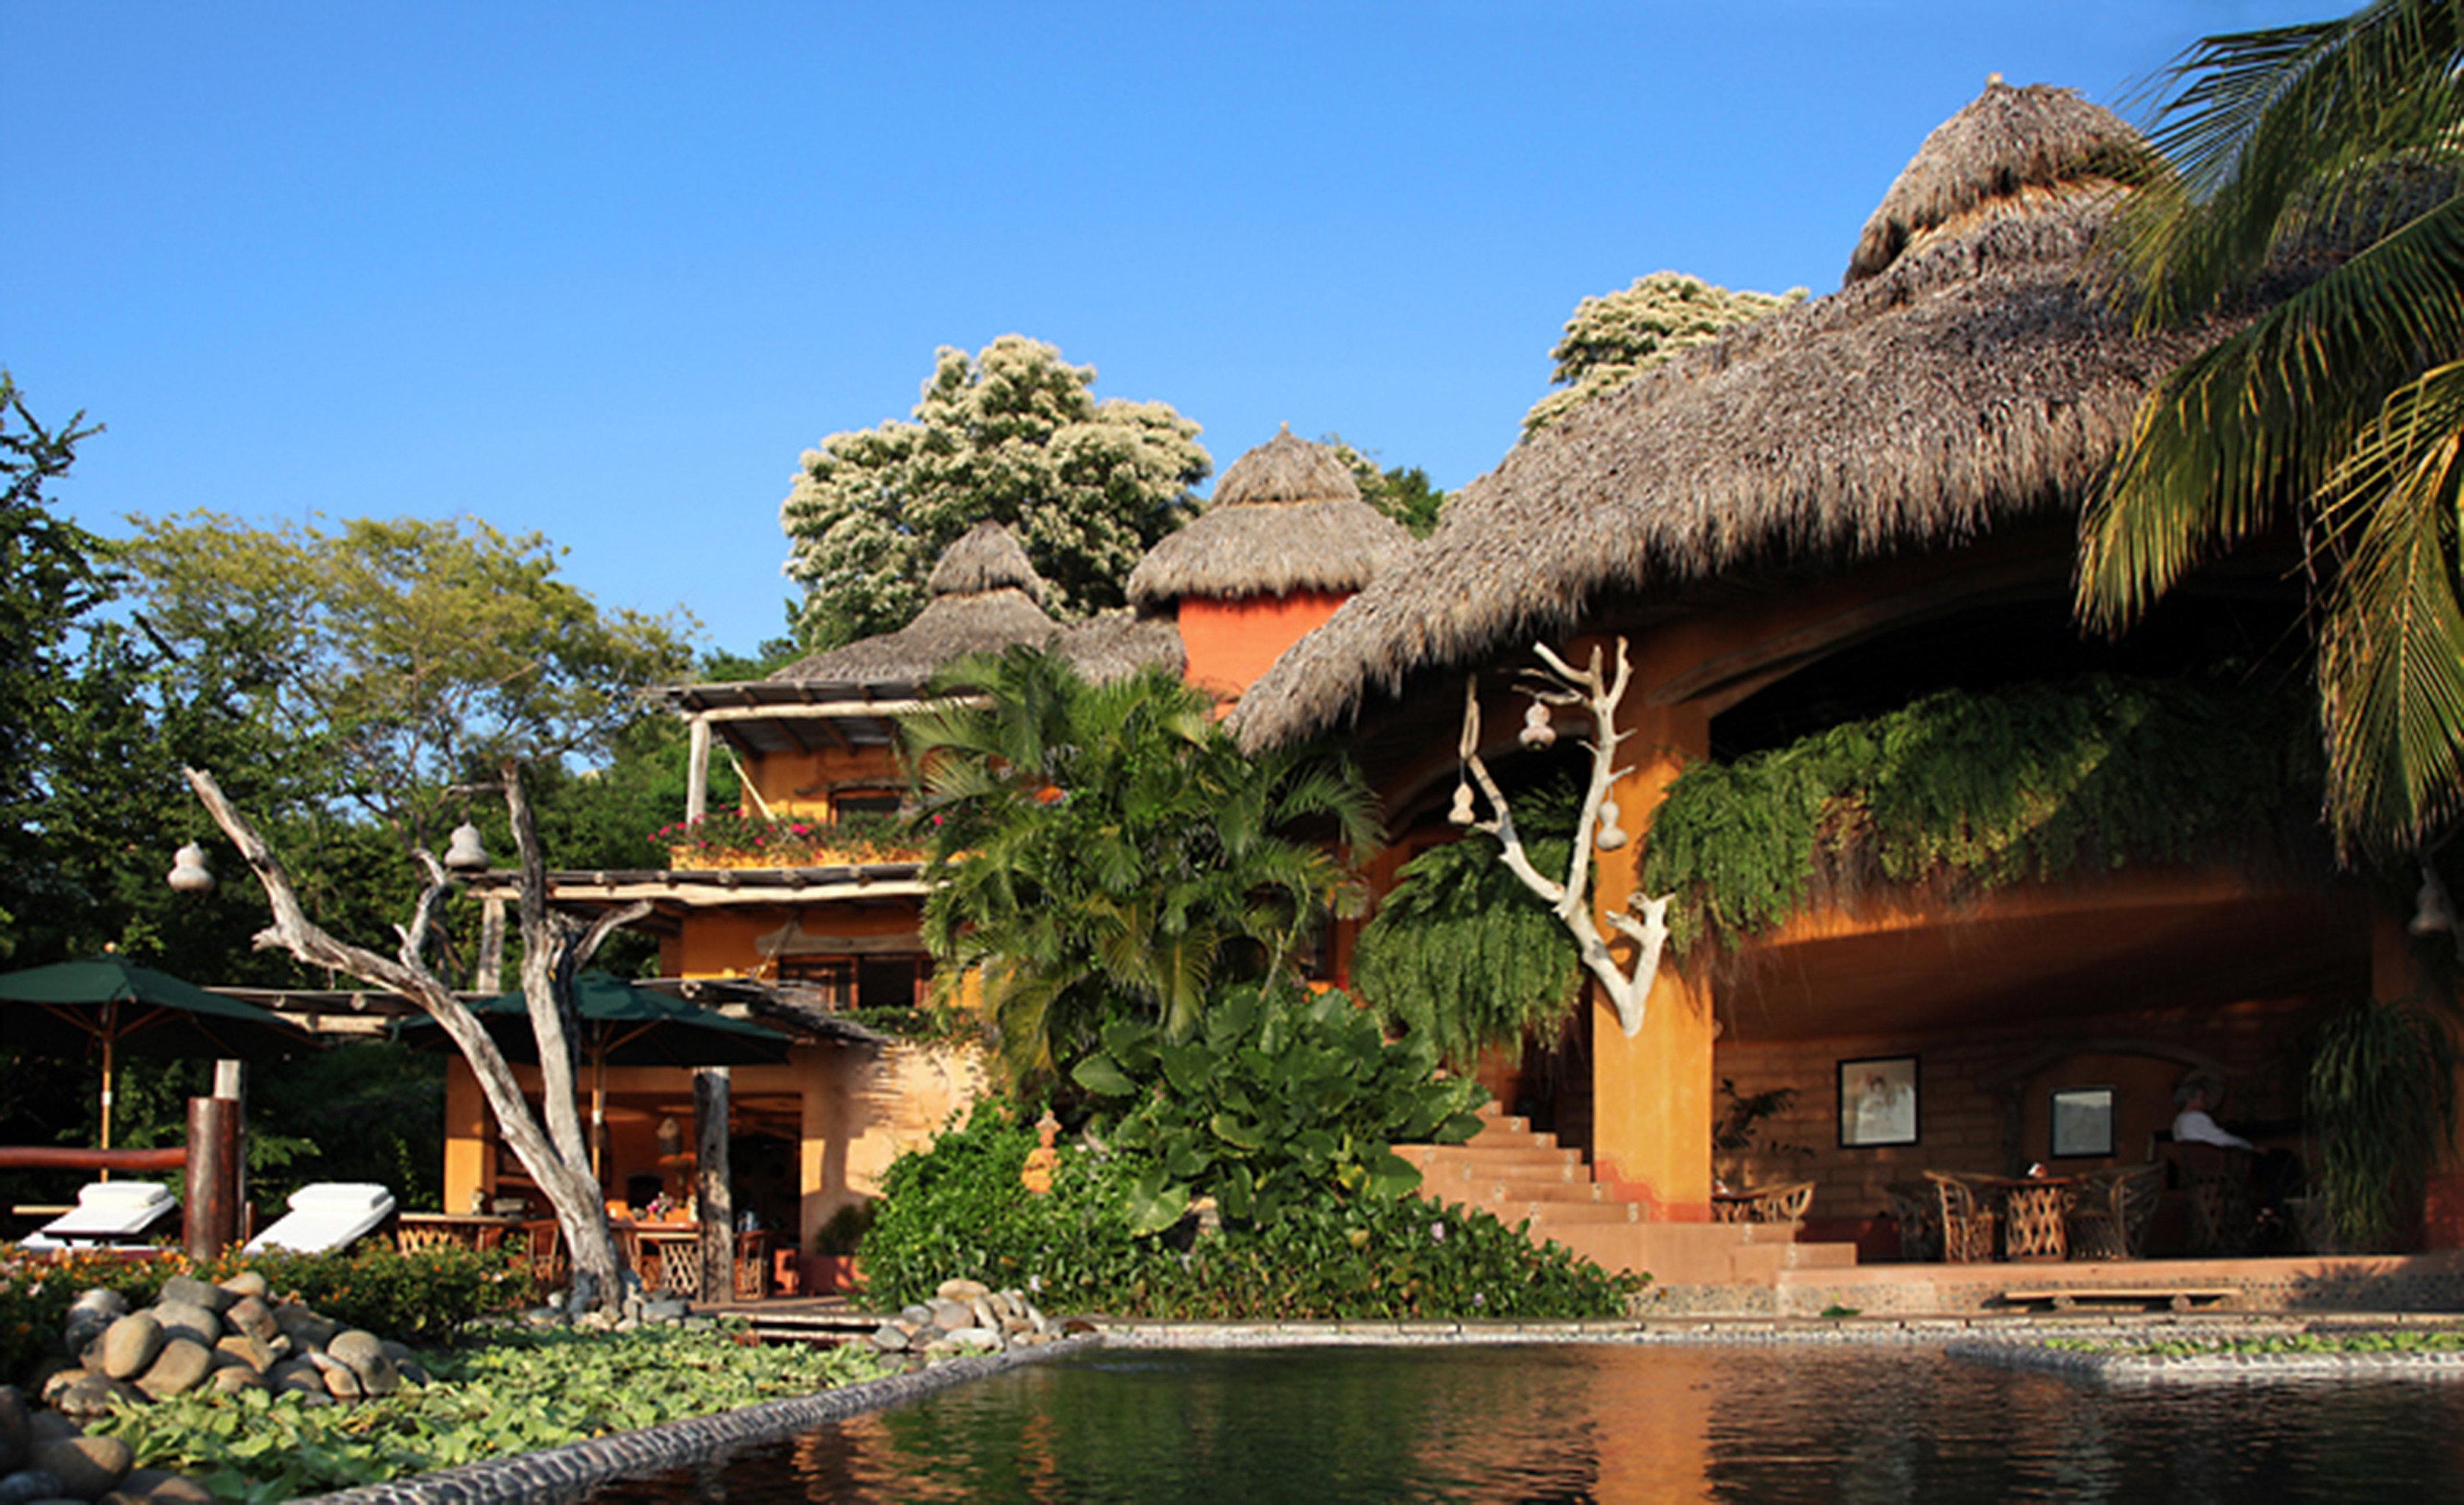 Beach Beachfront Buildings Exterior Mountains Ocean tree sky plant Resort house Village home Jungle Villa Garden